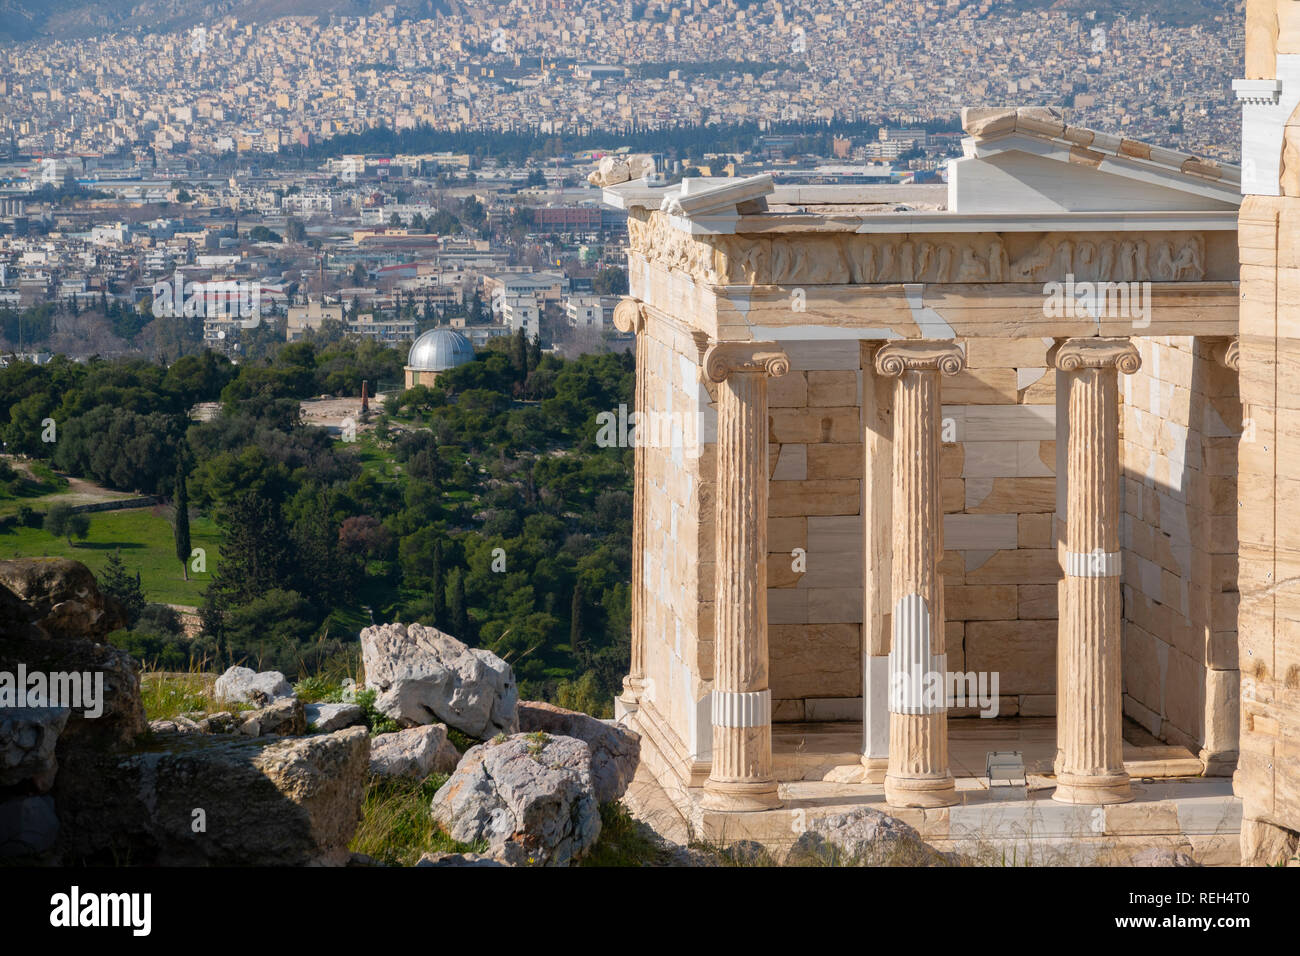 Europe Greece Athens Athena Acropolis part of the propylaea, propylea or propylaia gate of the Acropolis - Stock Image